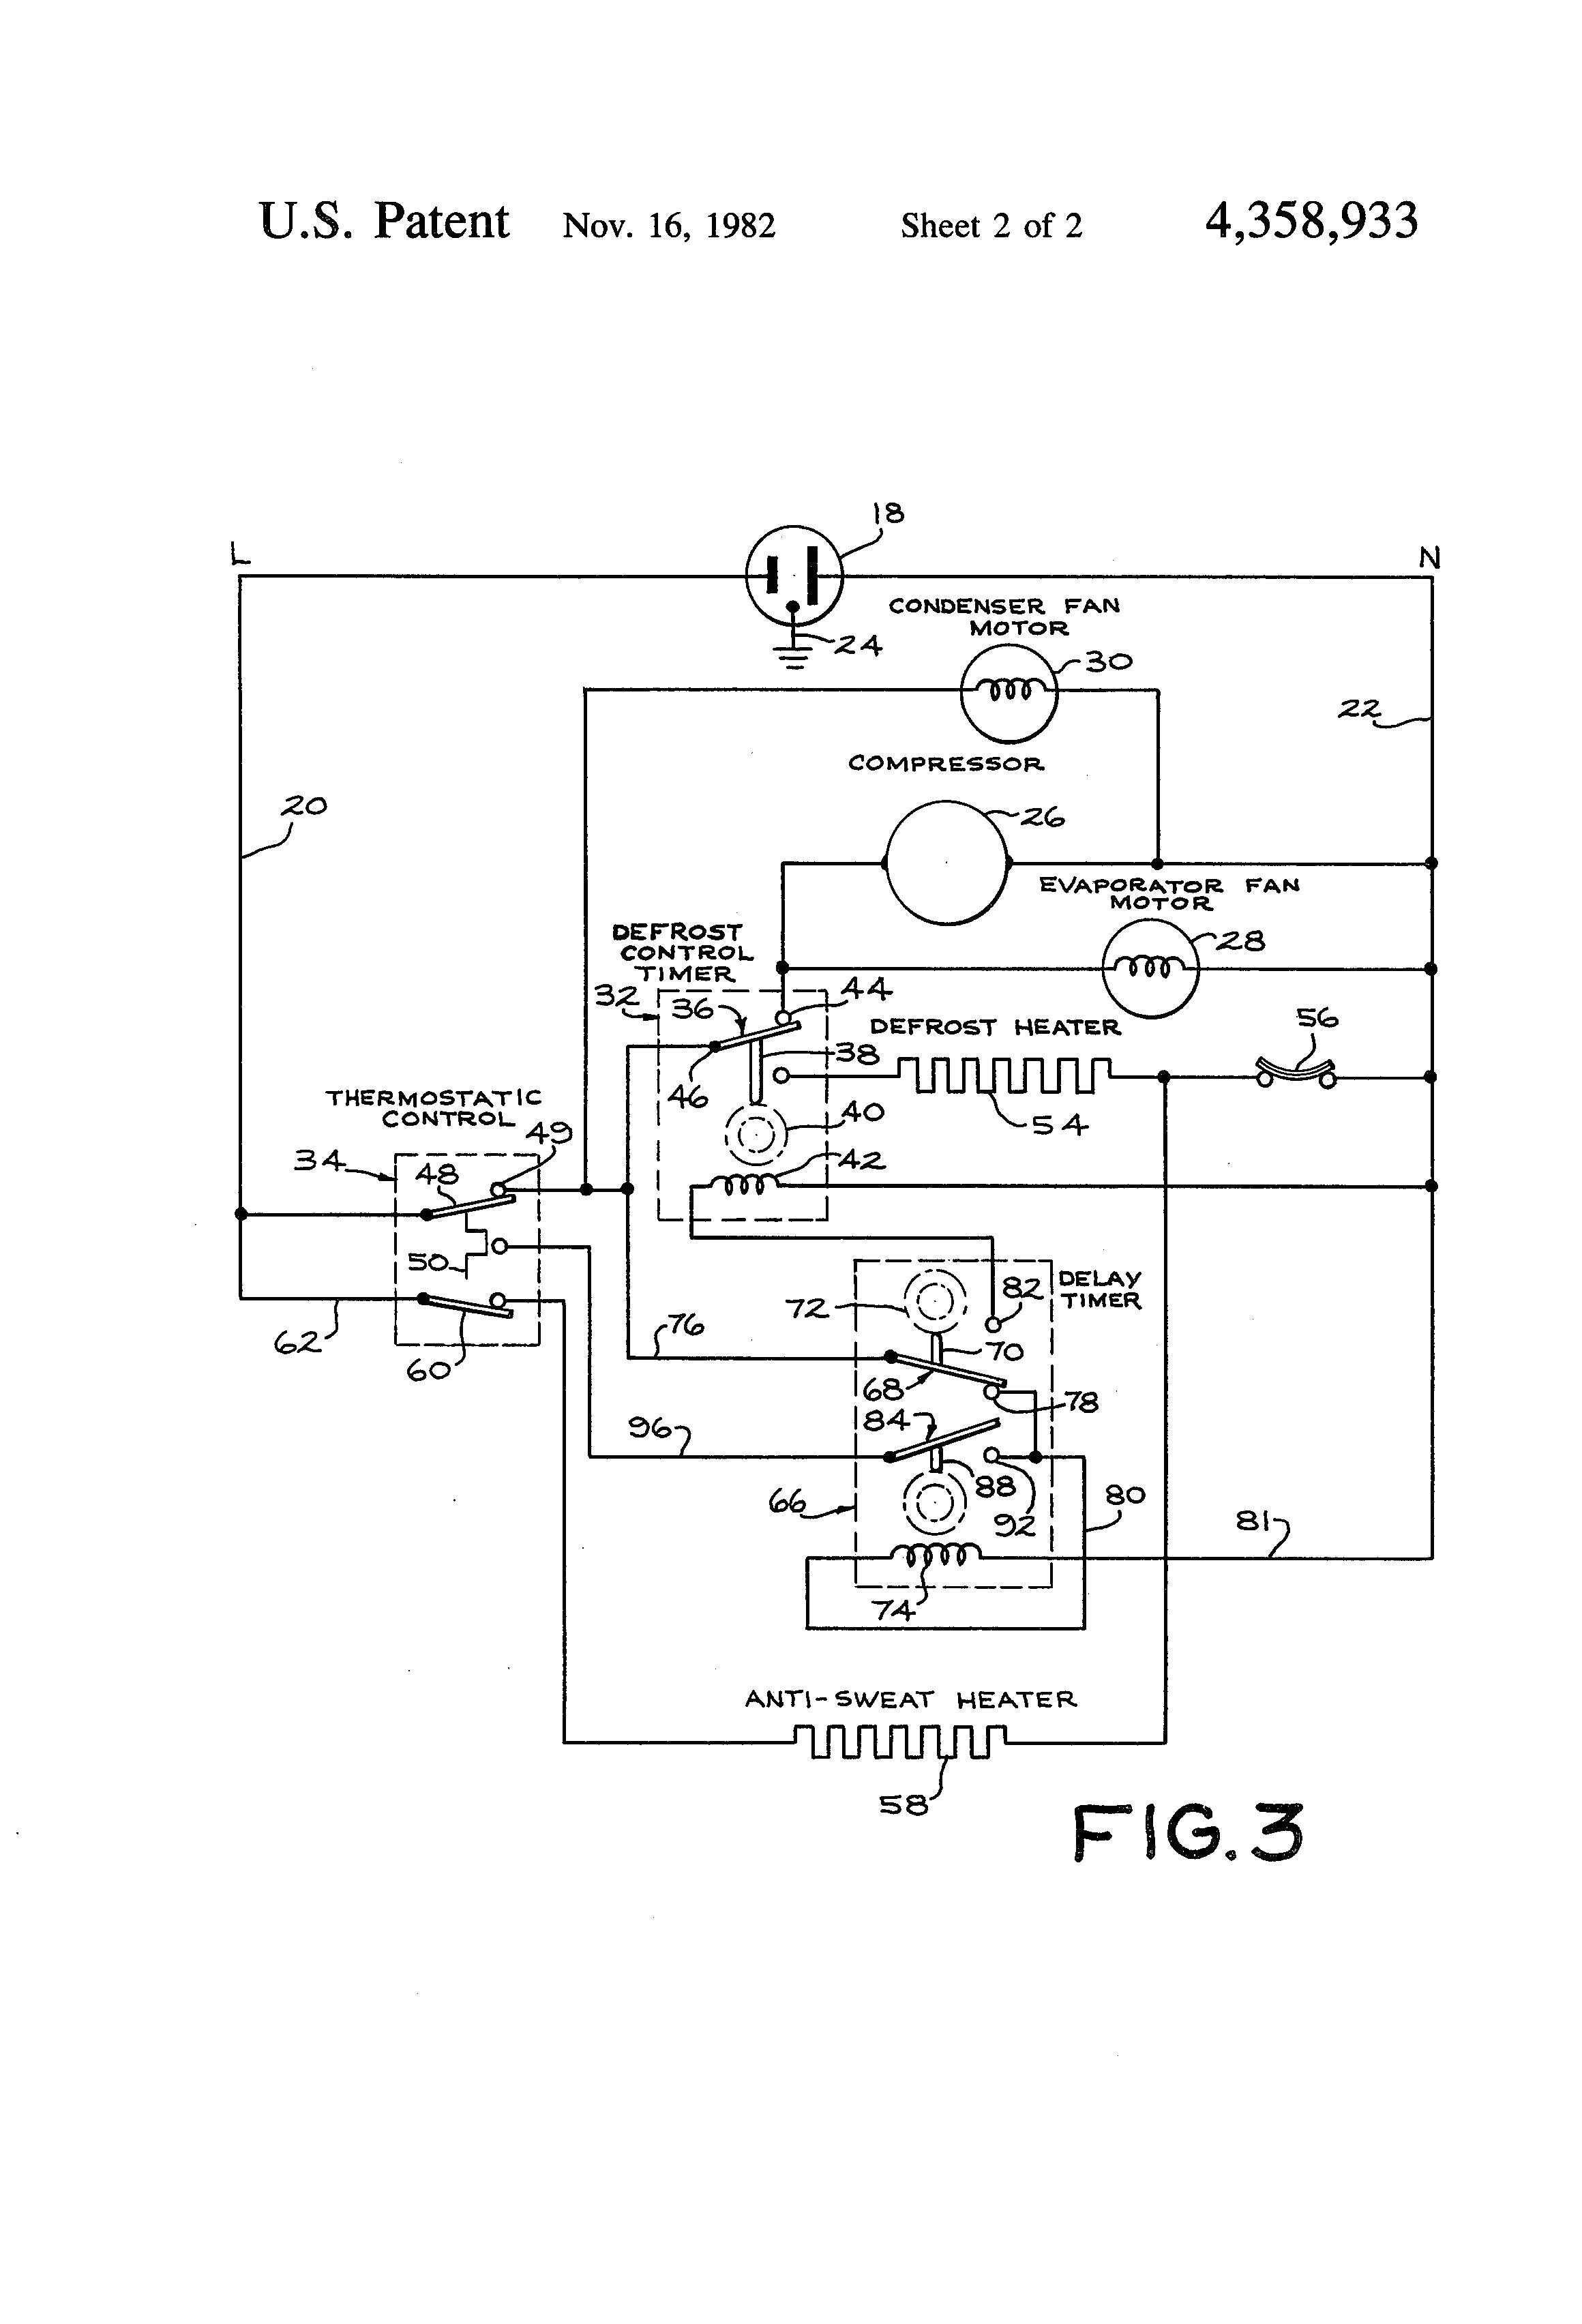 model wiring traulsen diagram ur48dt a wiring diagram preview model wiring traulsen diagram ur48dt a electrical